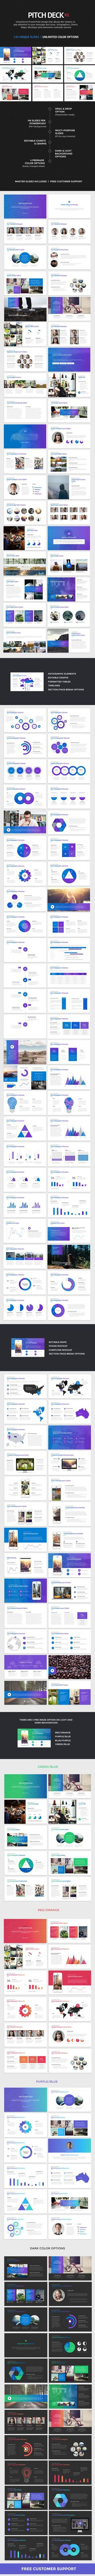 Pitch Deck Start Up Powerpoint Template #design #slides Download: http://graphicriver.net/item/pitch-deck-start-up-powerpoint/12253011?ref=ksioks